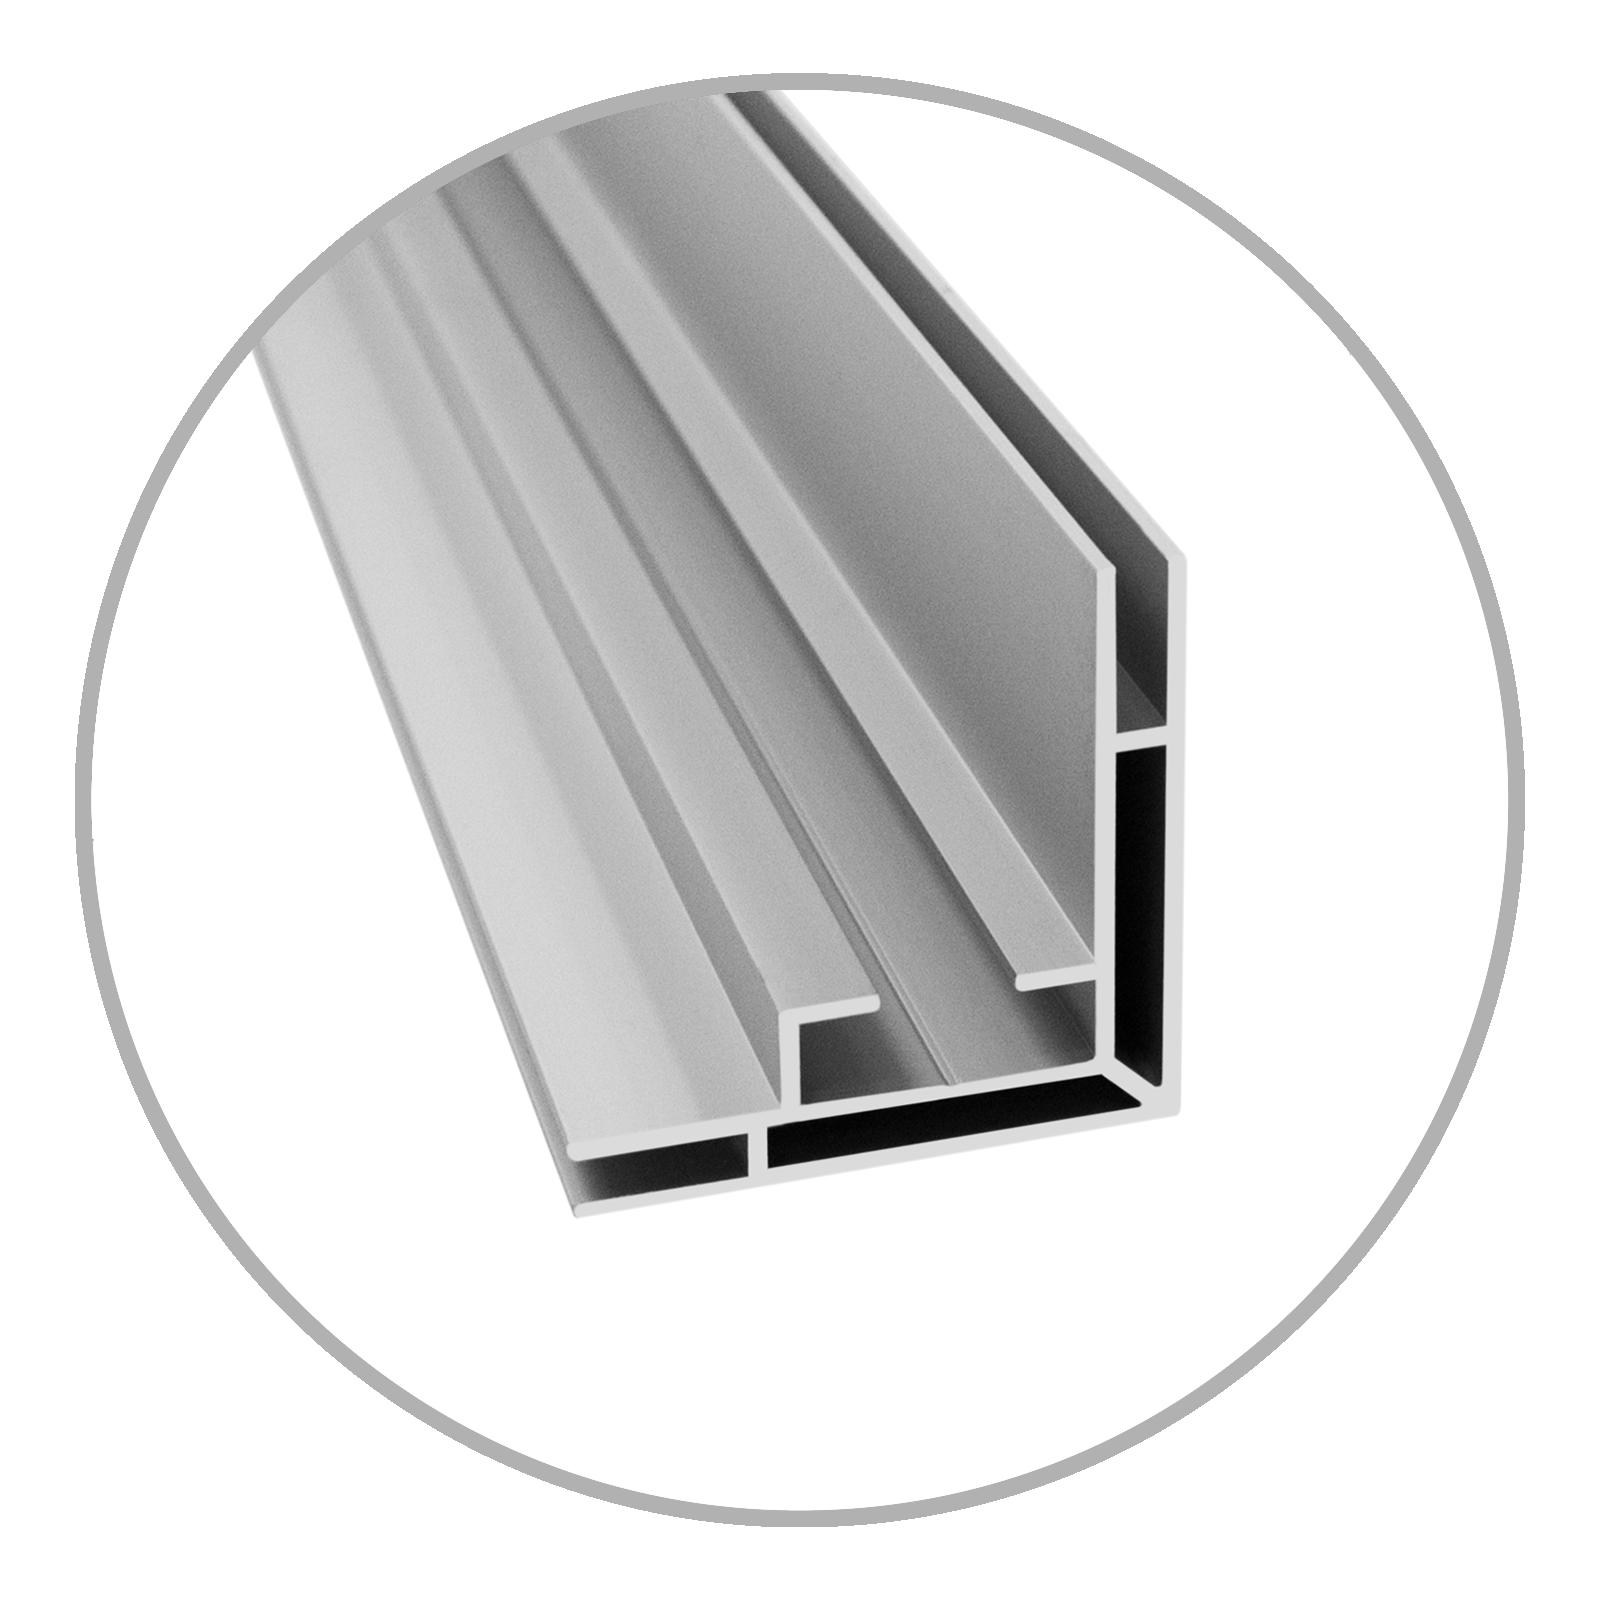 Easyframe Profil 50 Lighbox silber